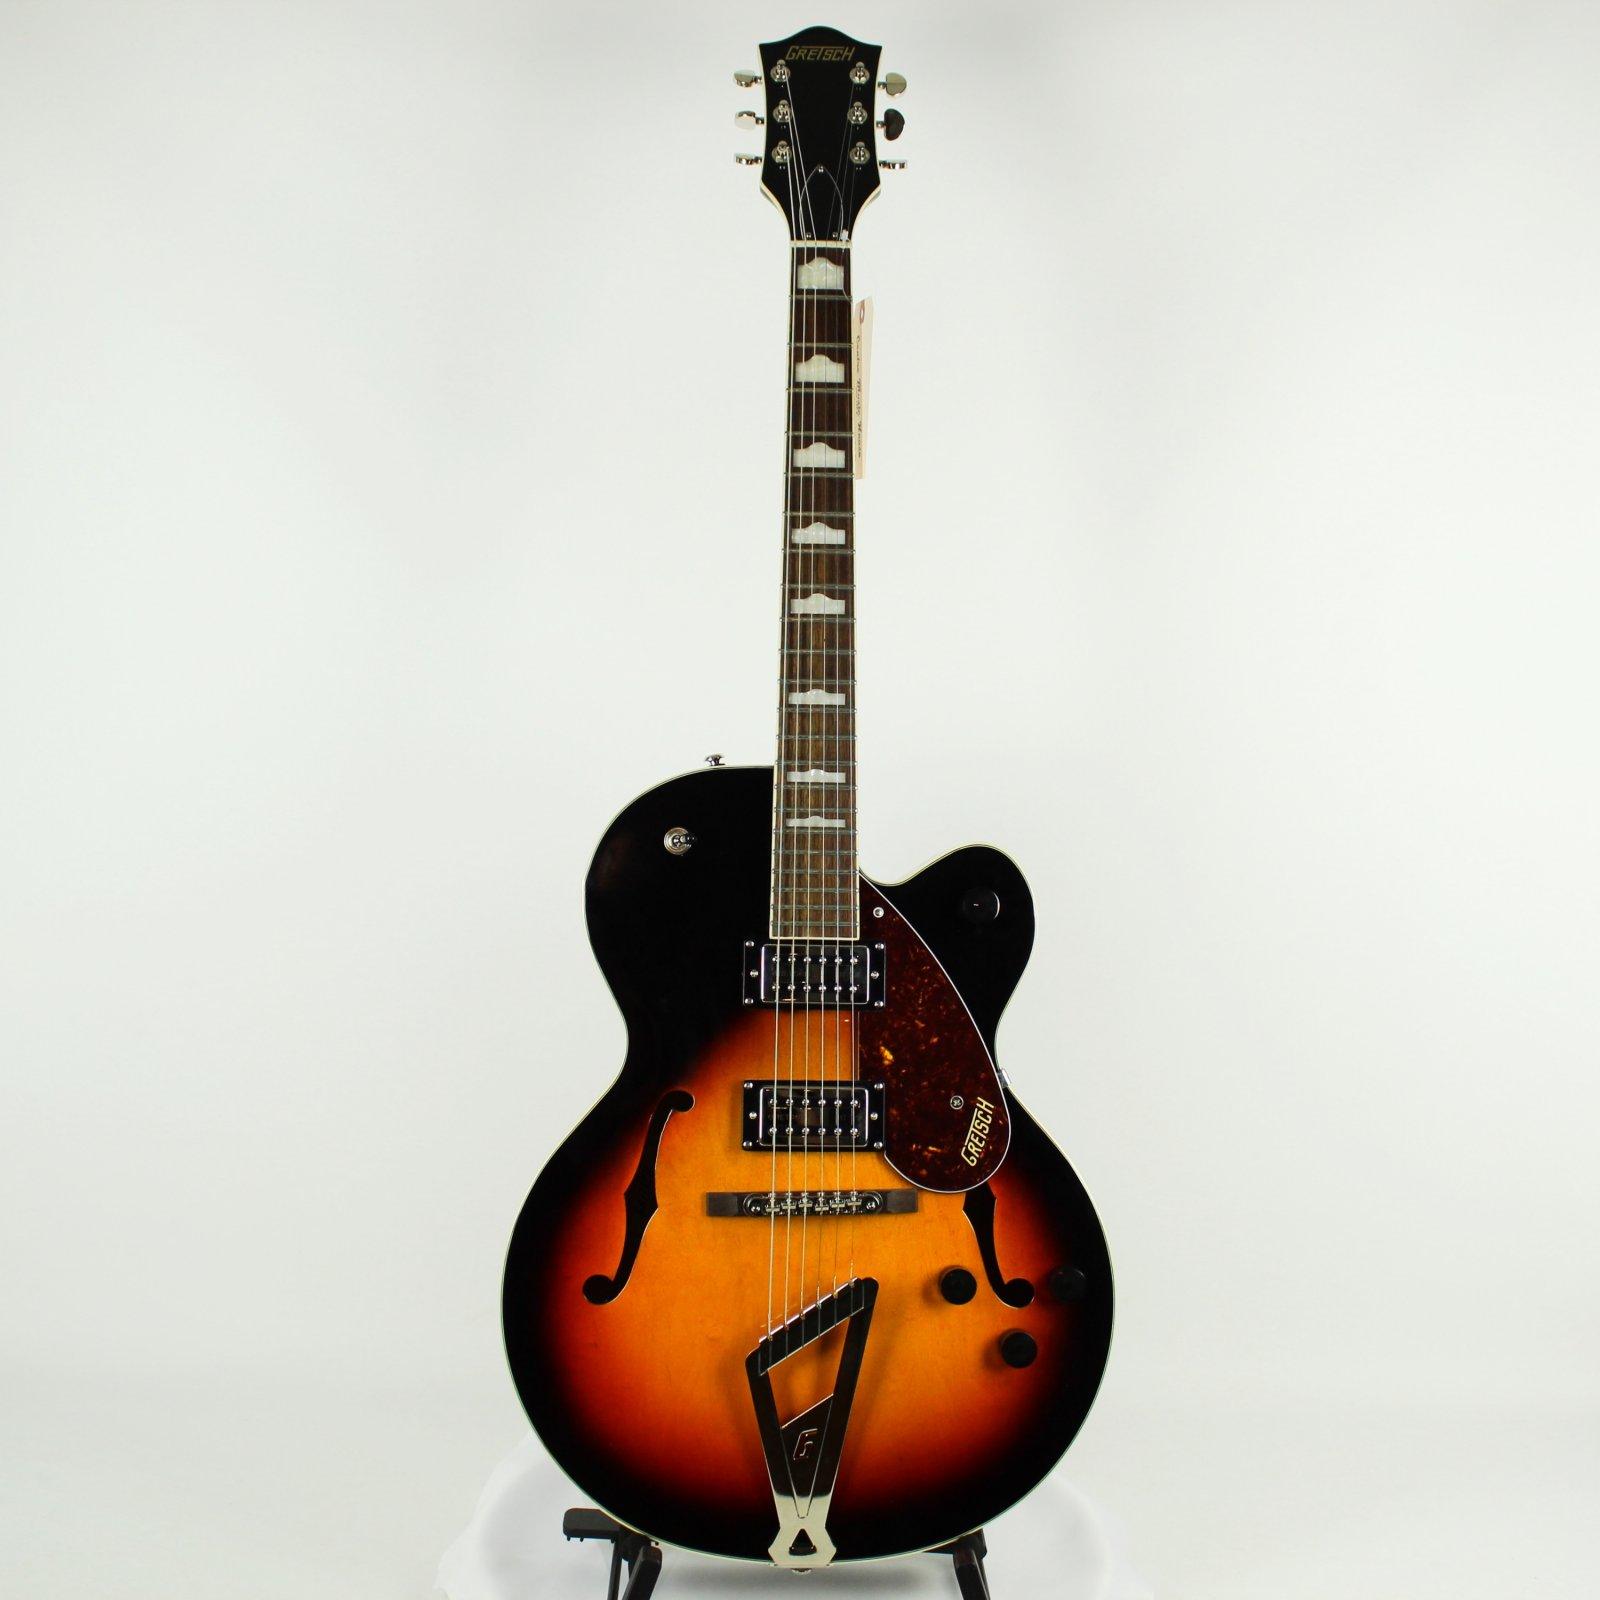 Gretsch G2420 Streamliner™ Hollow Body Electric Guitar, Aged Brooklyn Burst (USED)